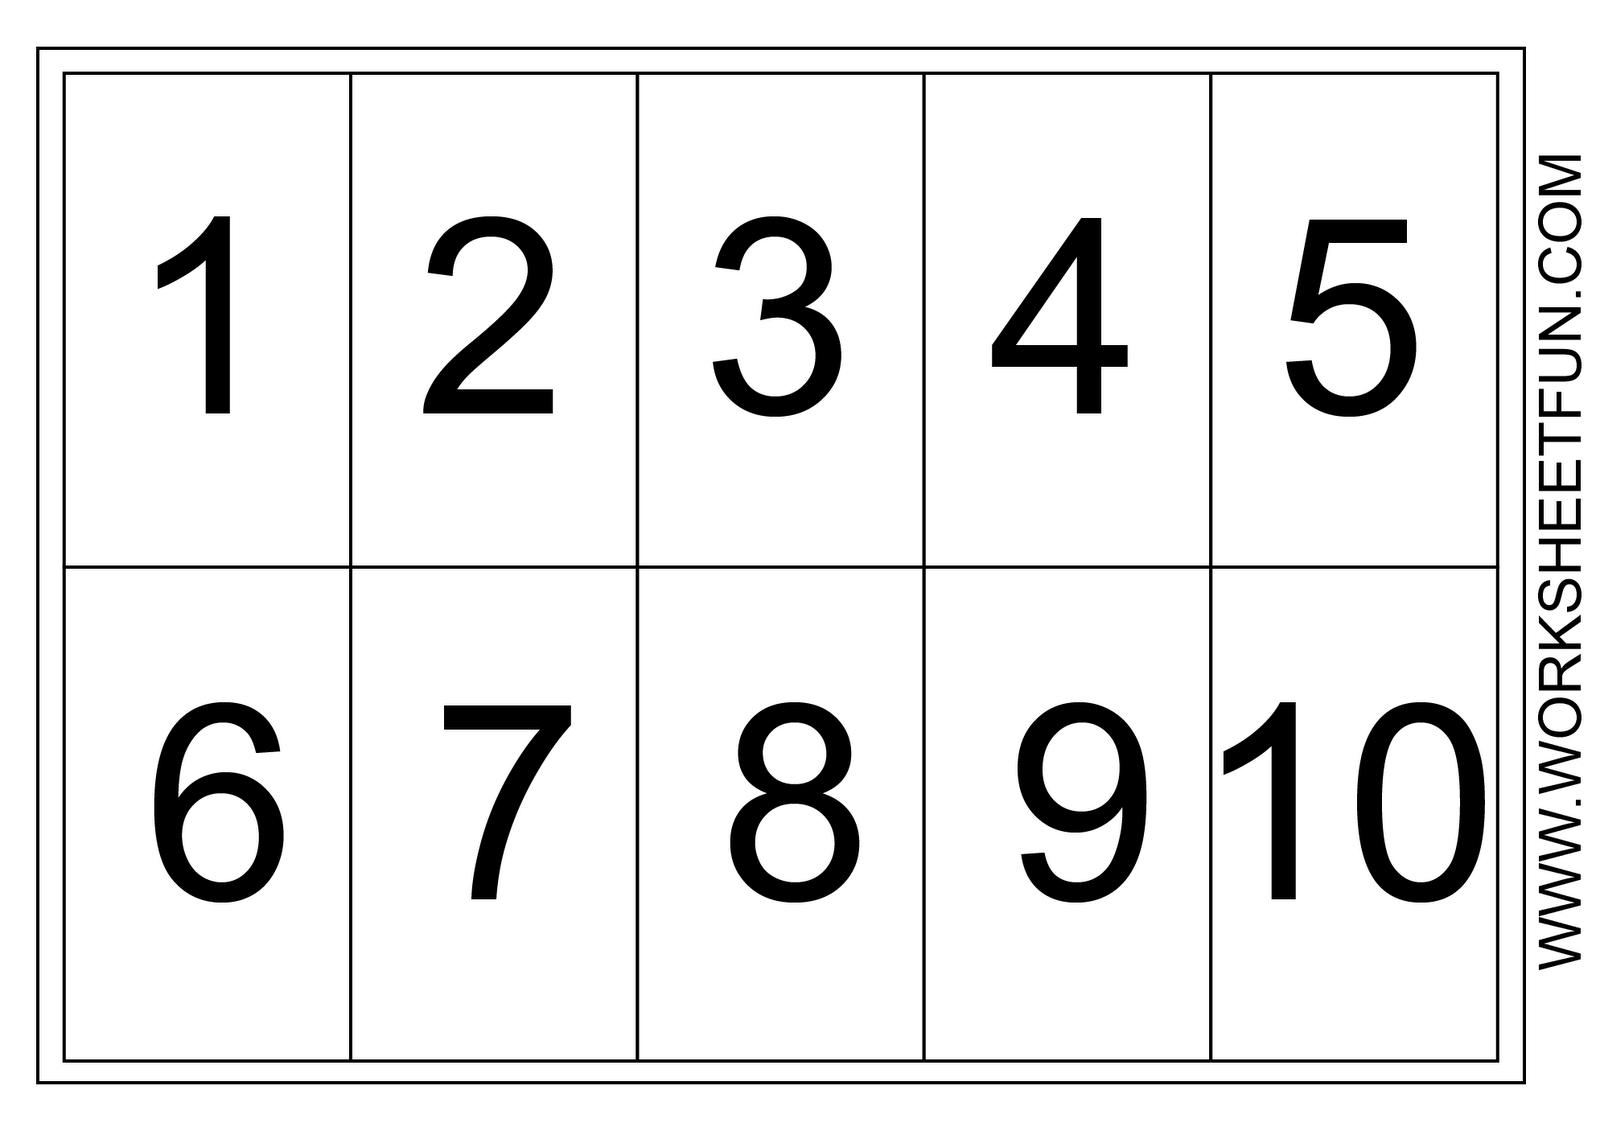 Printables For Numbers 1 10 With Of Free Number Worksheets Focuses - Free Printable Numbers 1 10